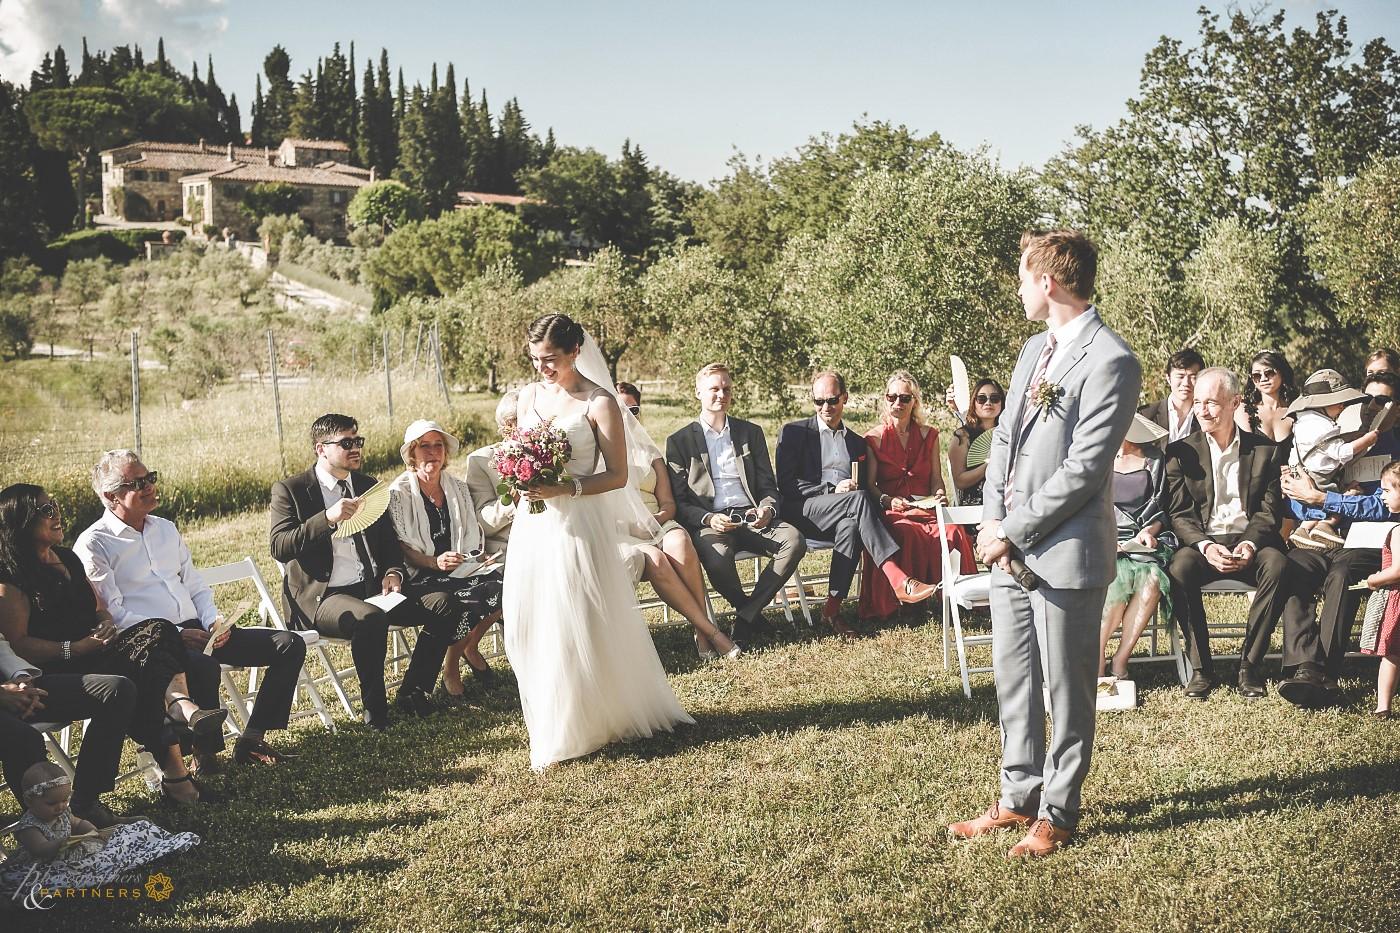 photographers_weddings_italy_04.jpg